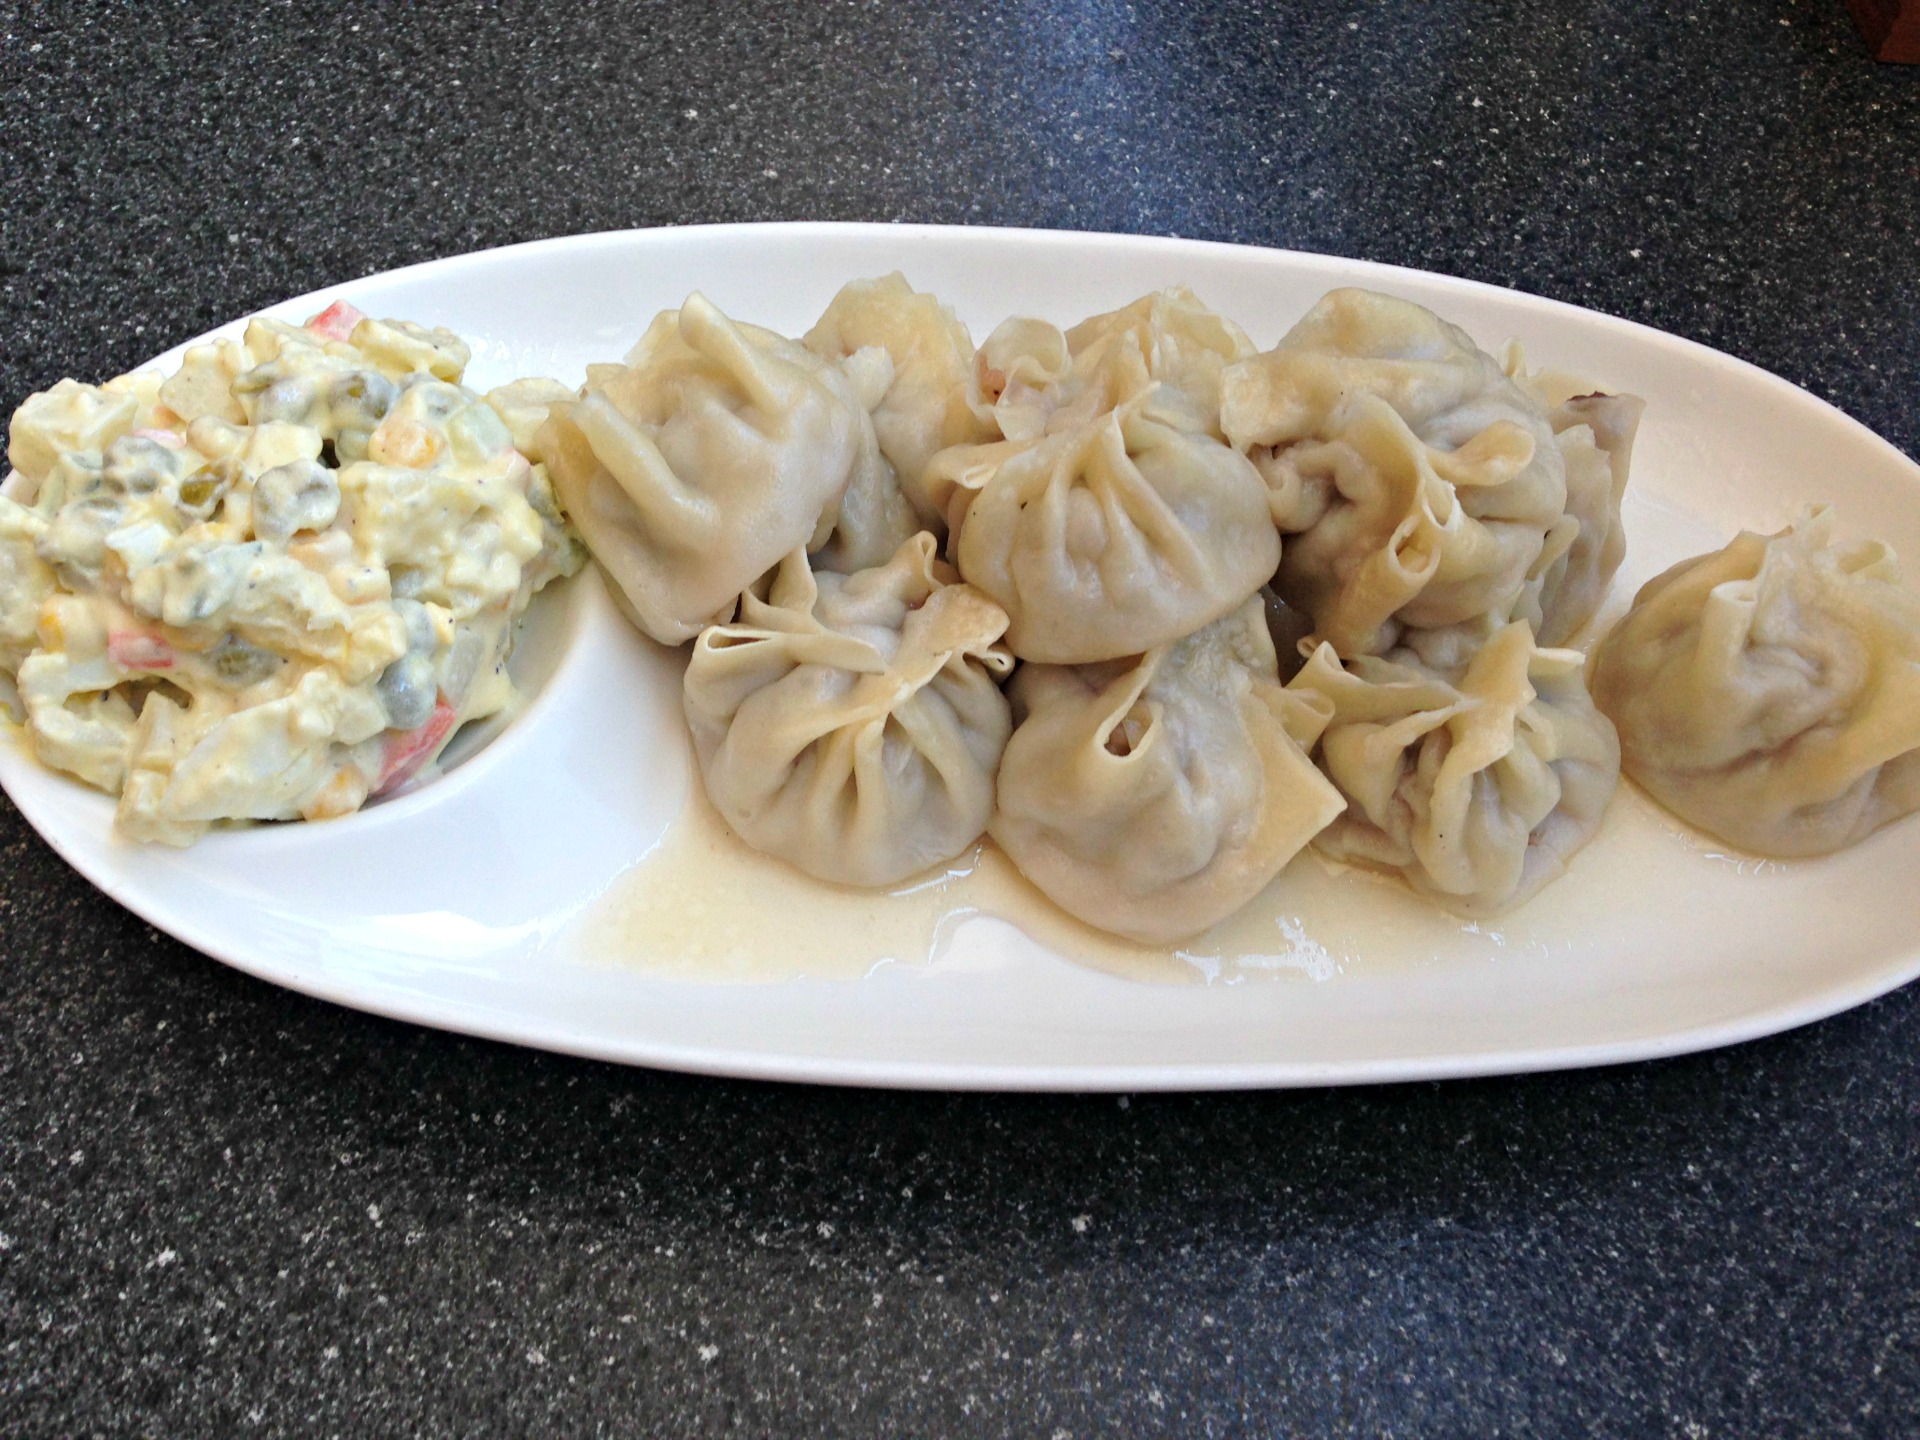 Buuz, a type of Mongolian dumpling, from Togi's in Oakland.